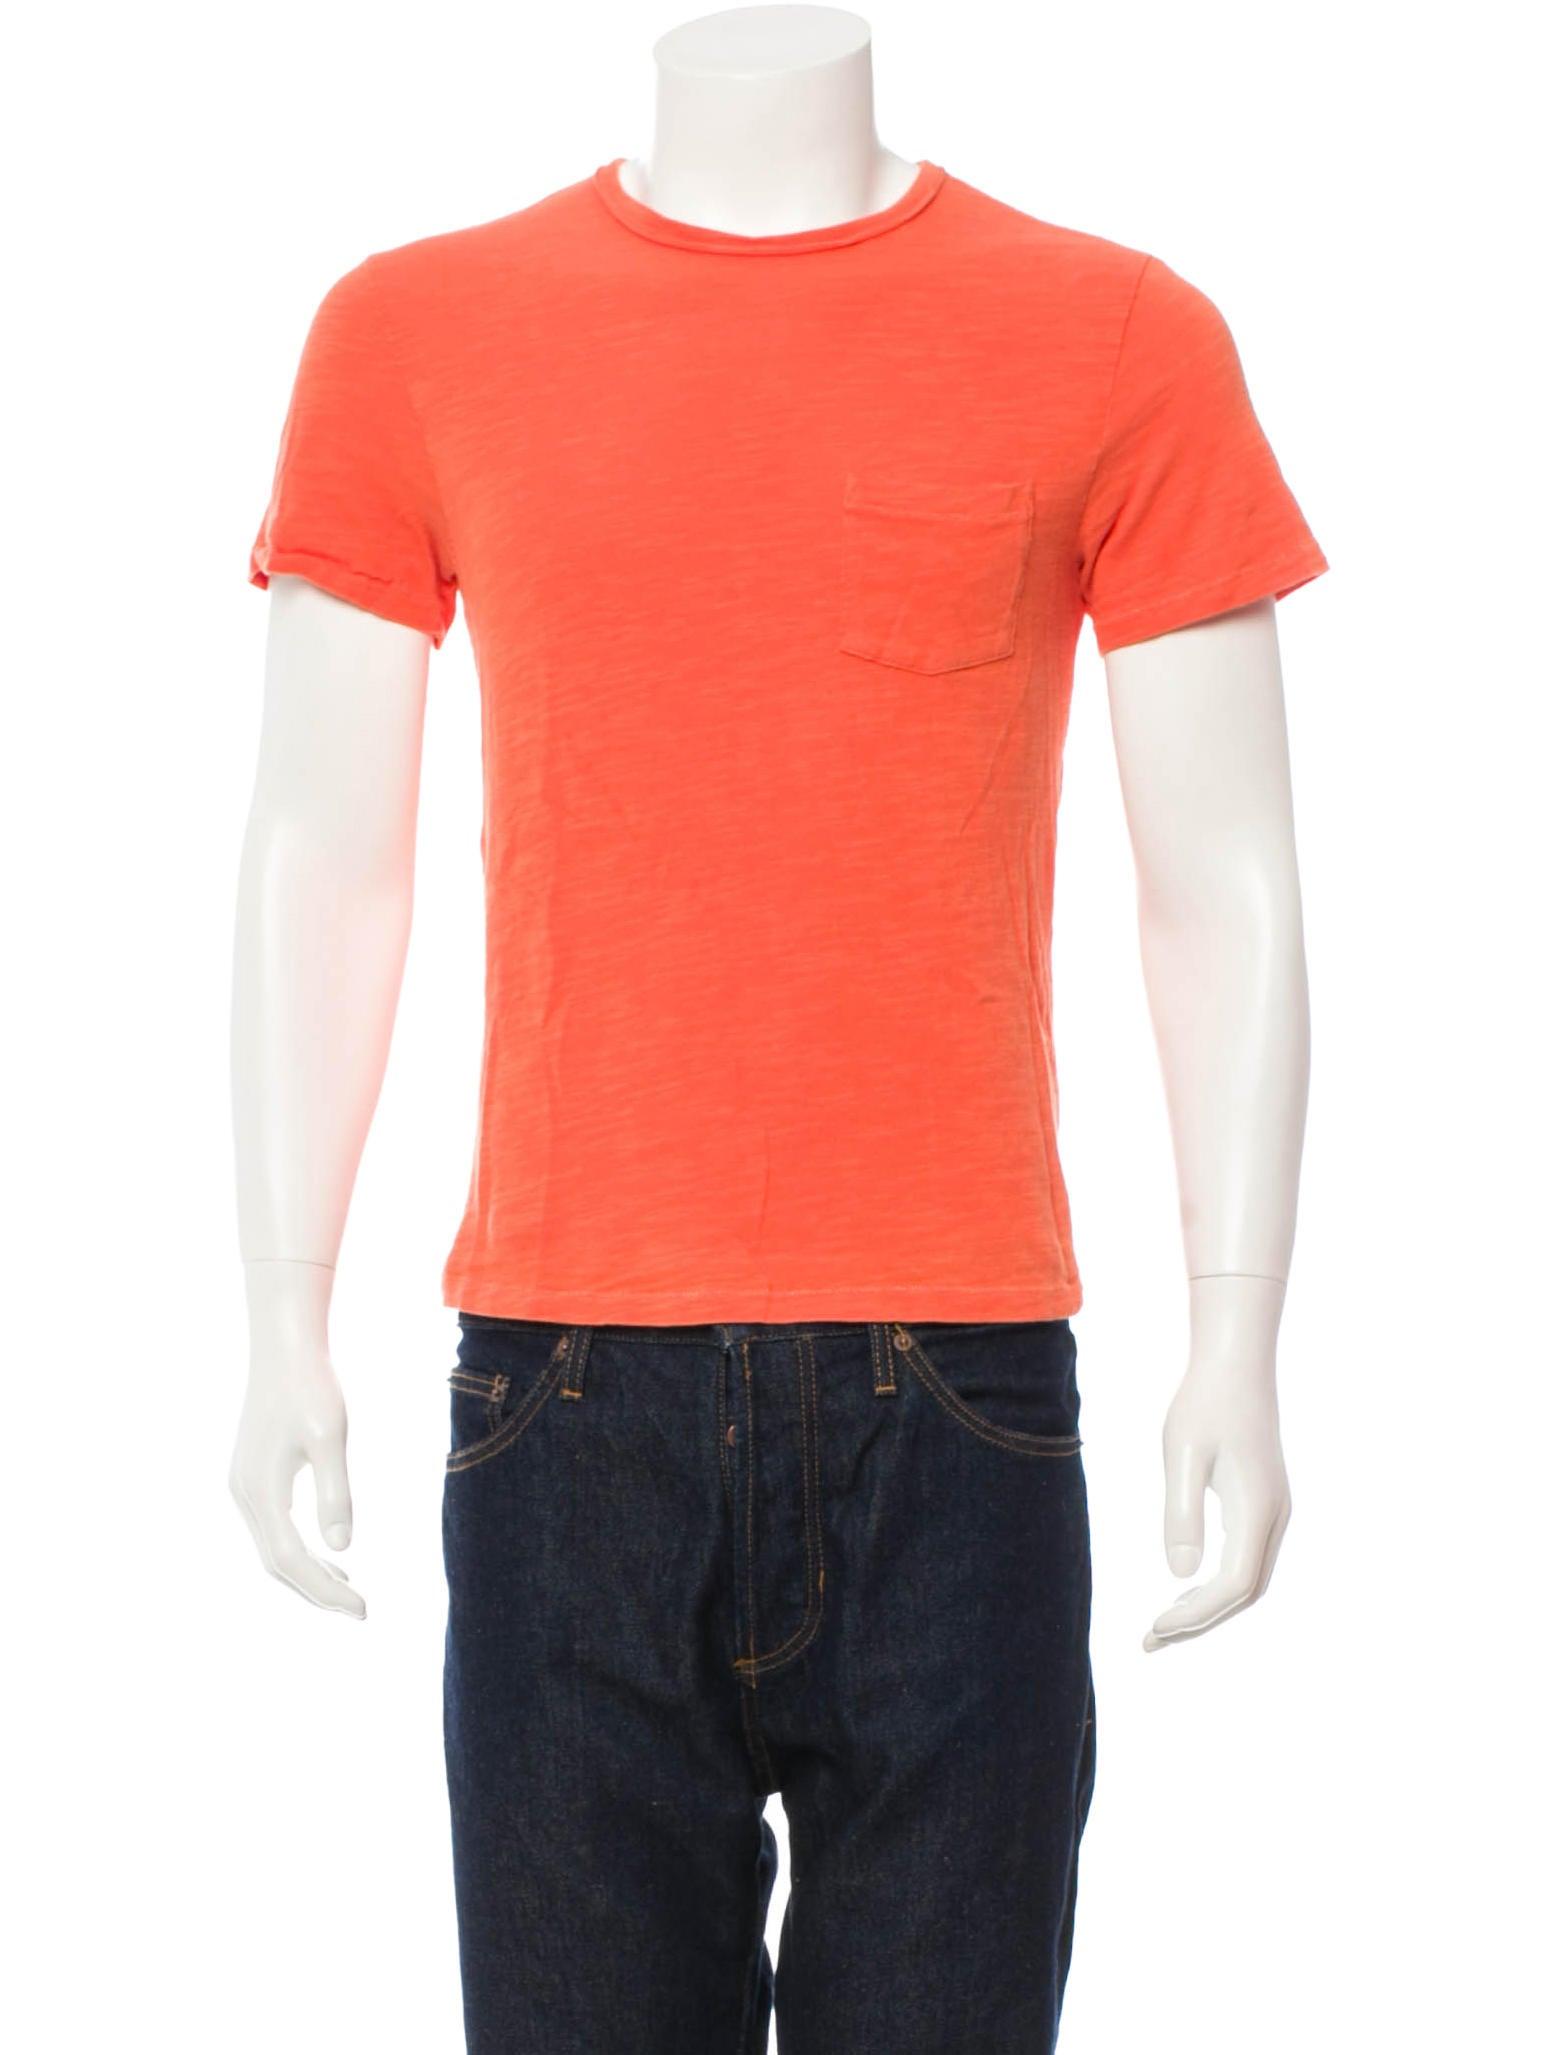 Rag Bone T Shirt Clothing Wragb31434 The Realreal